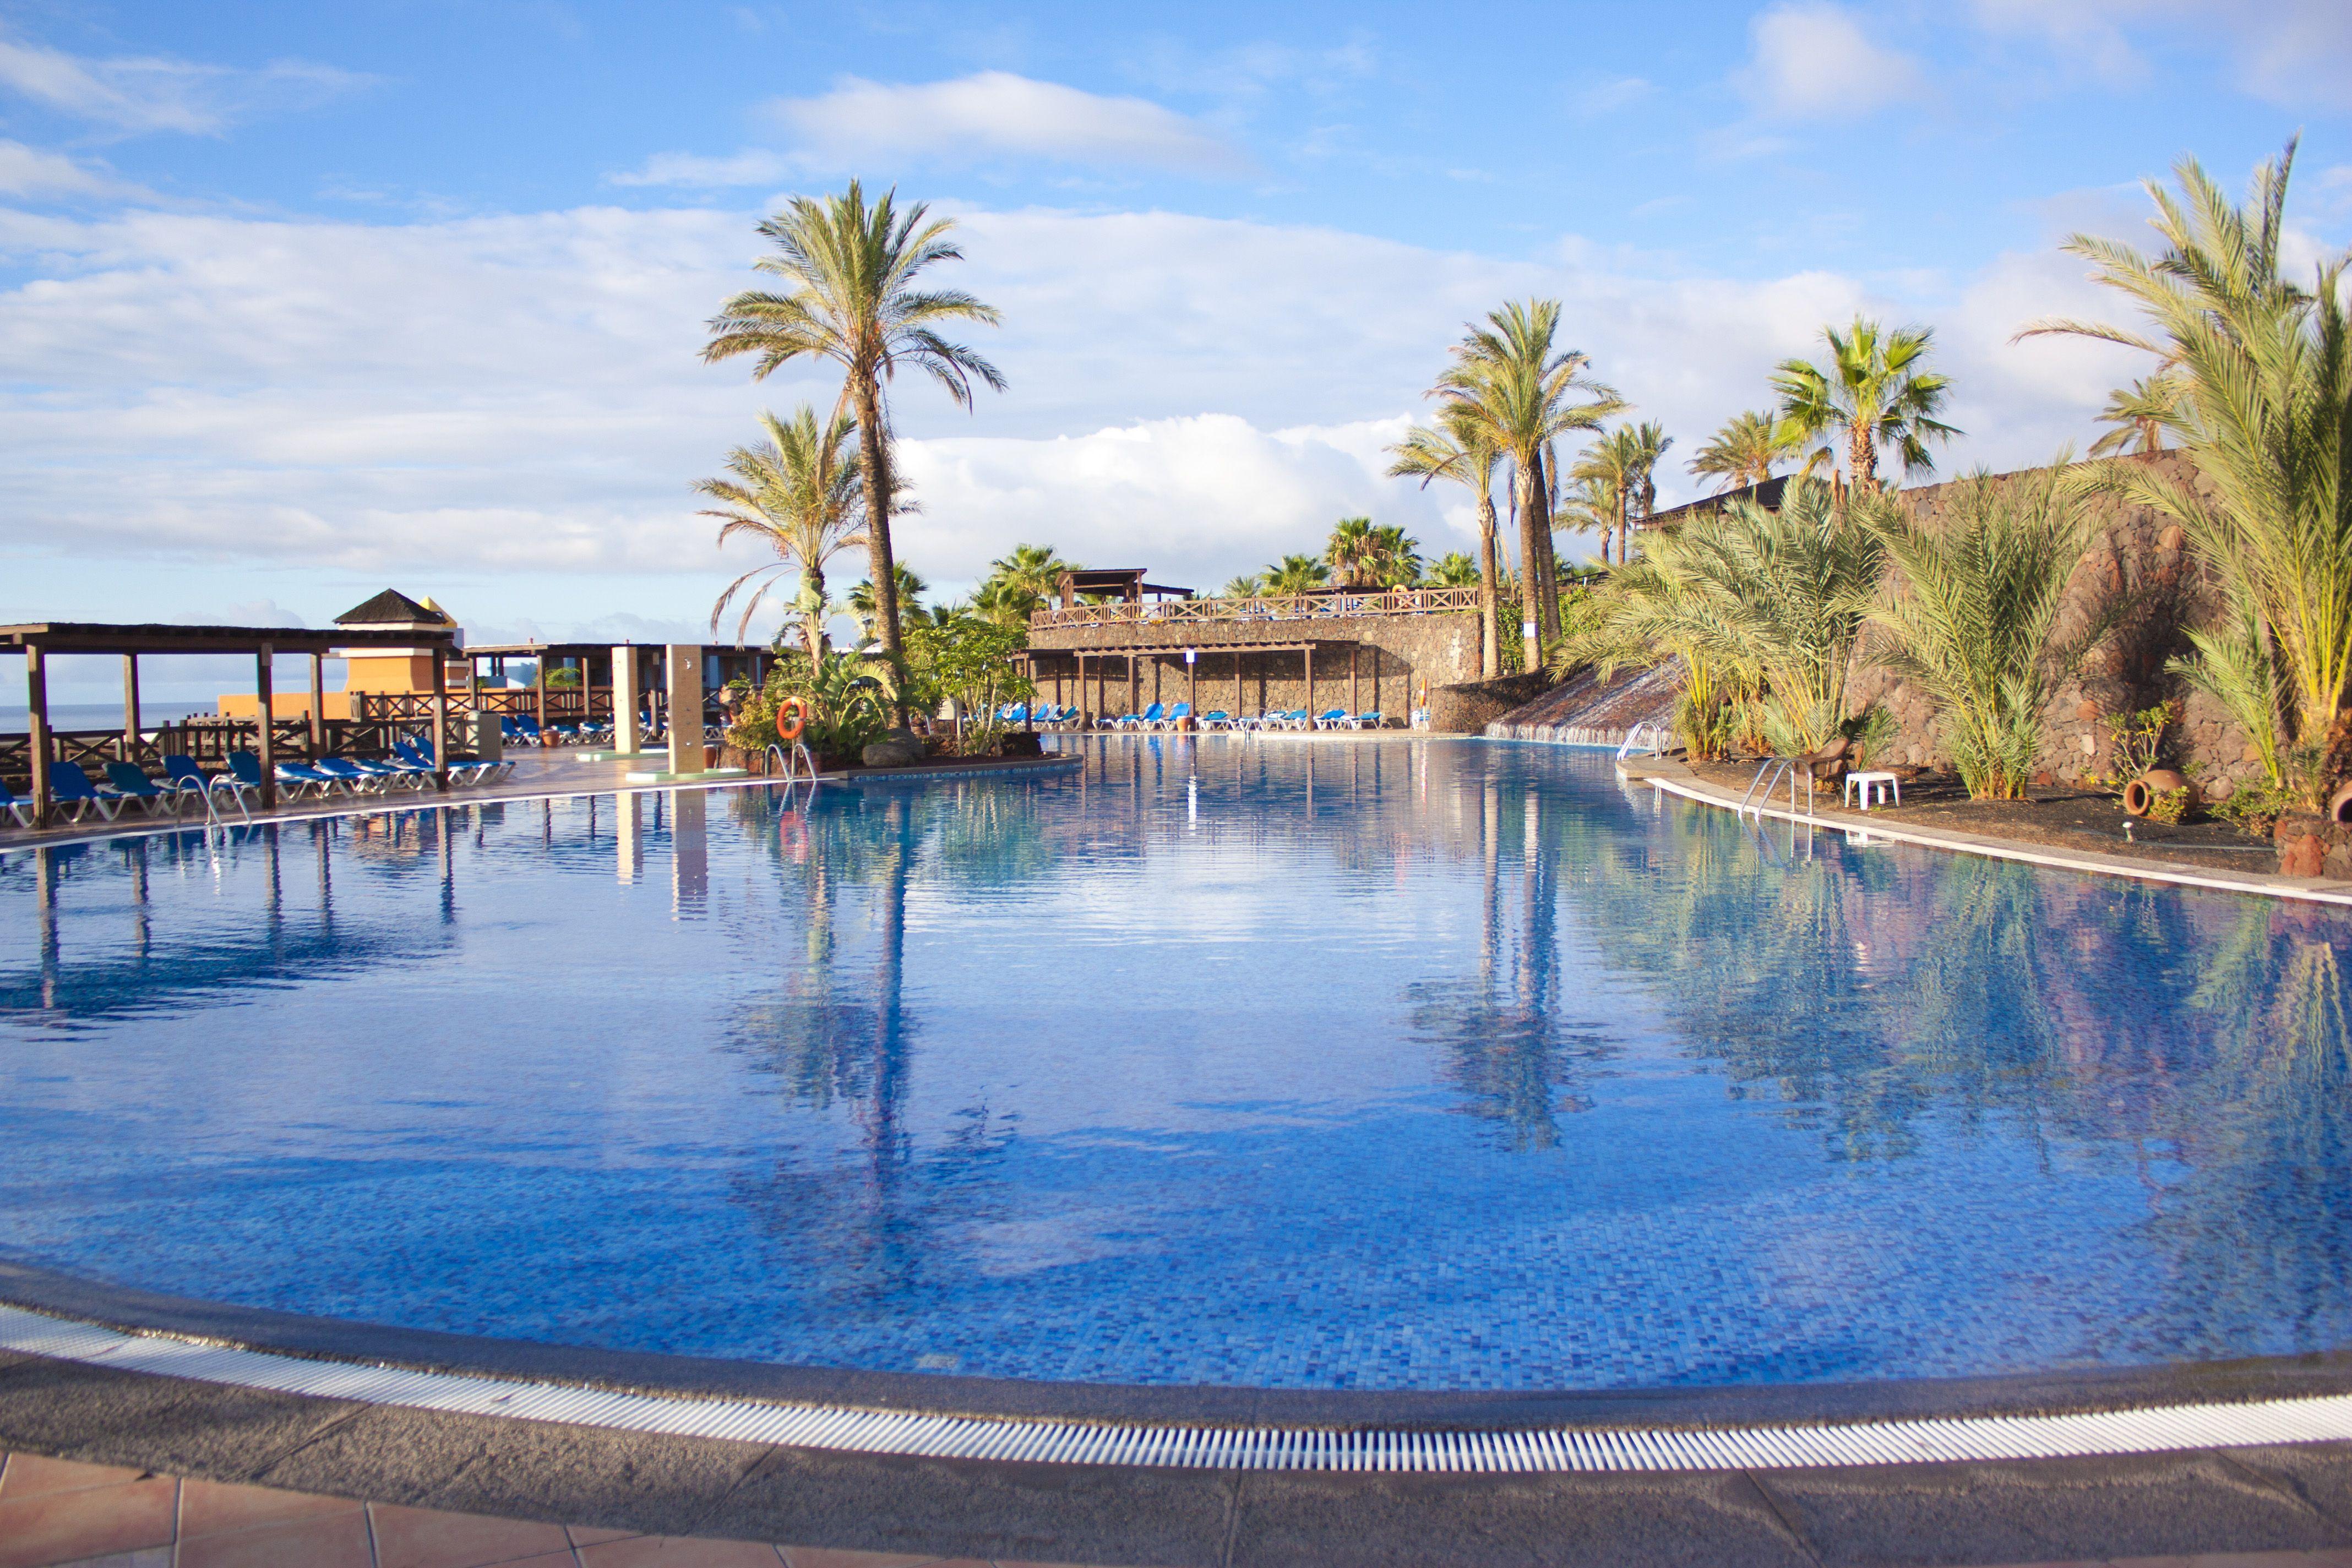 Pool in Fuerteventura